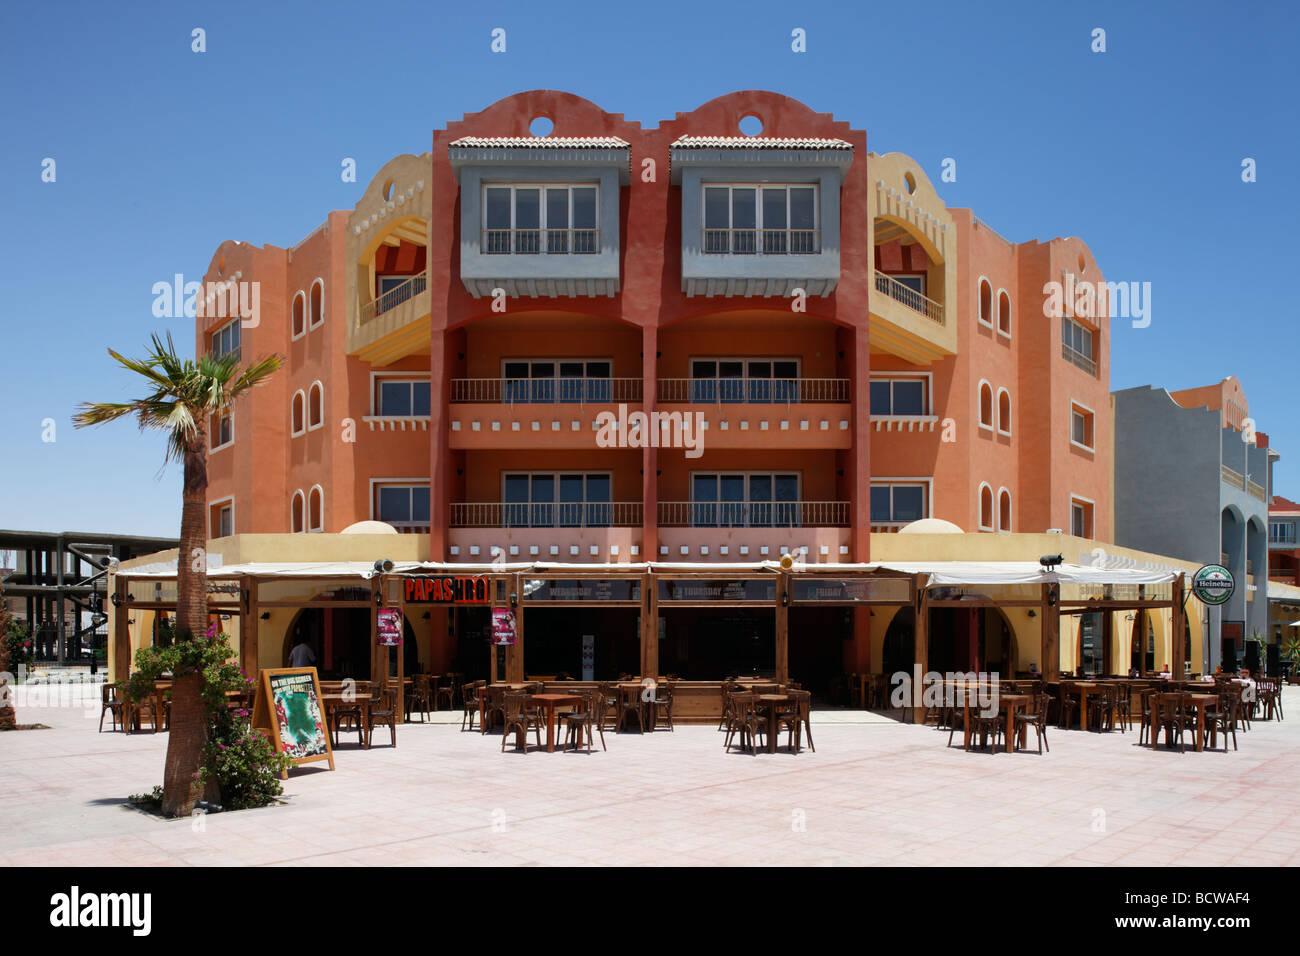 Restaurant en plein air, bar, maisons, Hurghada, Egypte, Mer Rouge, Afrique Photo Stock